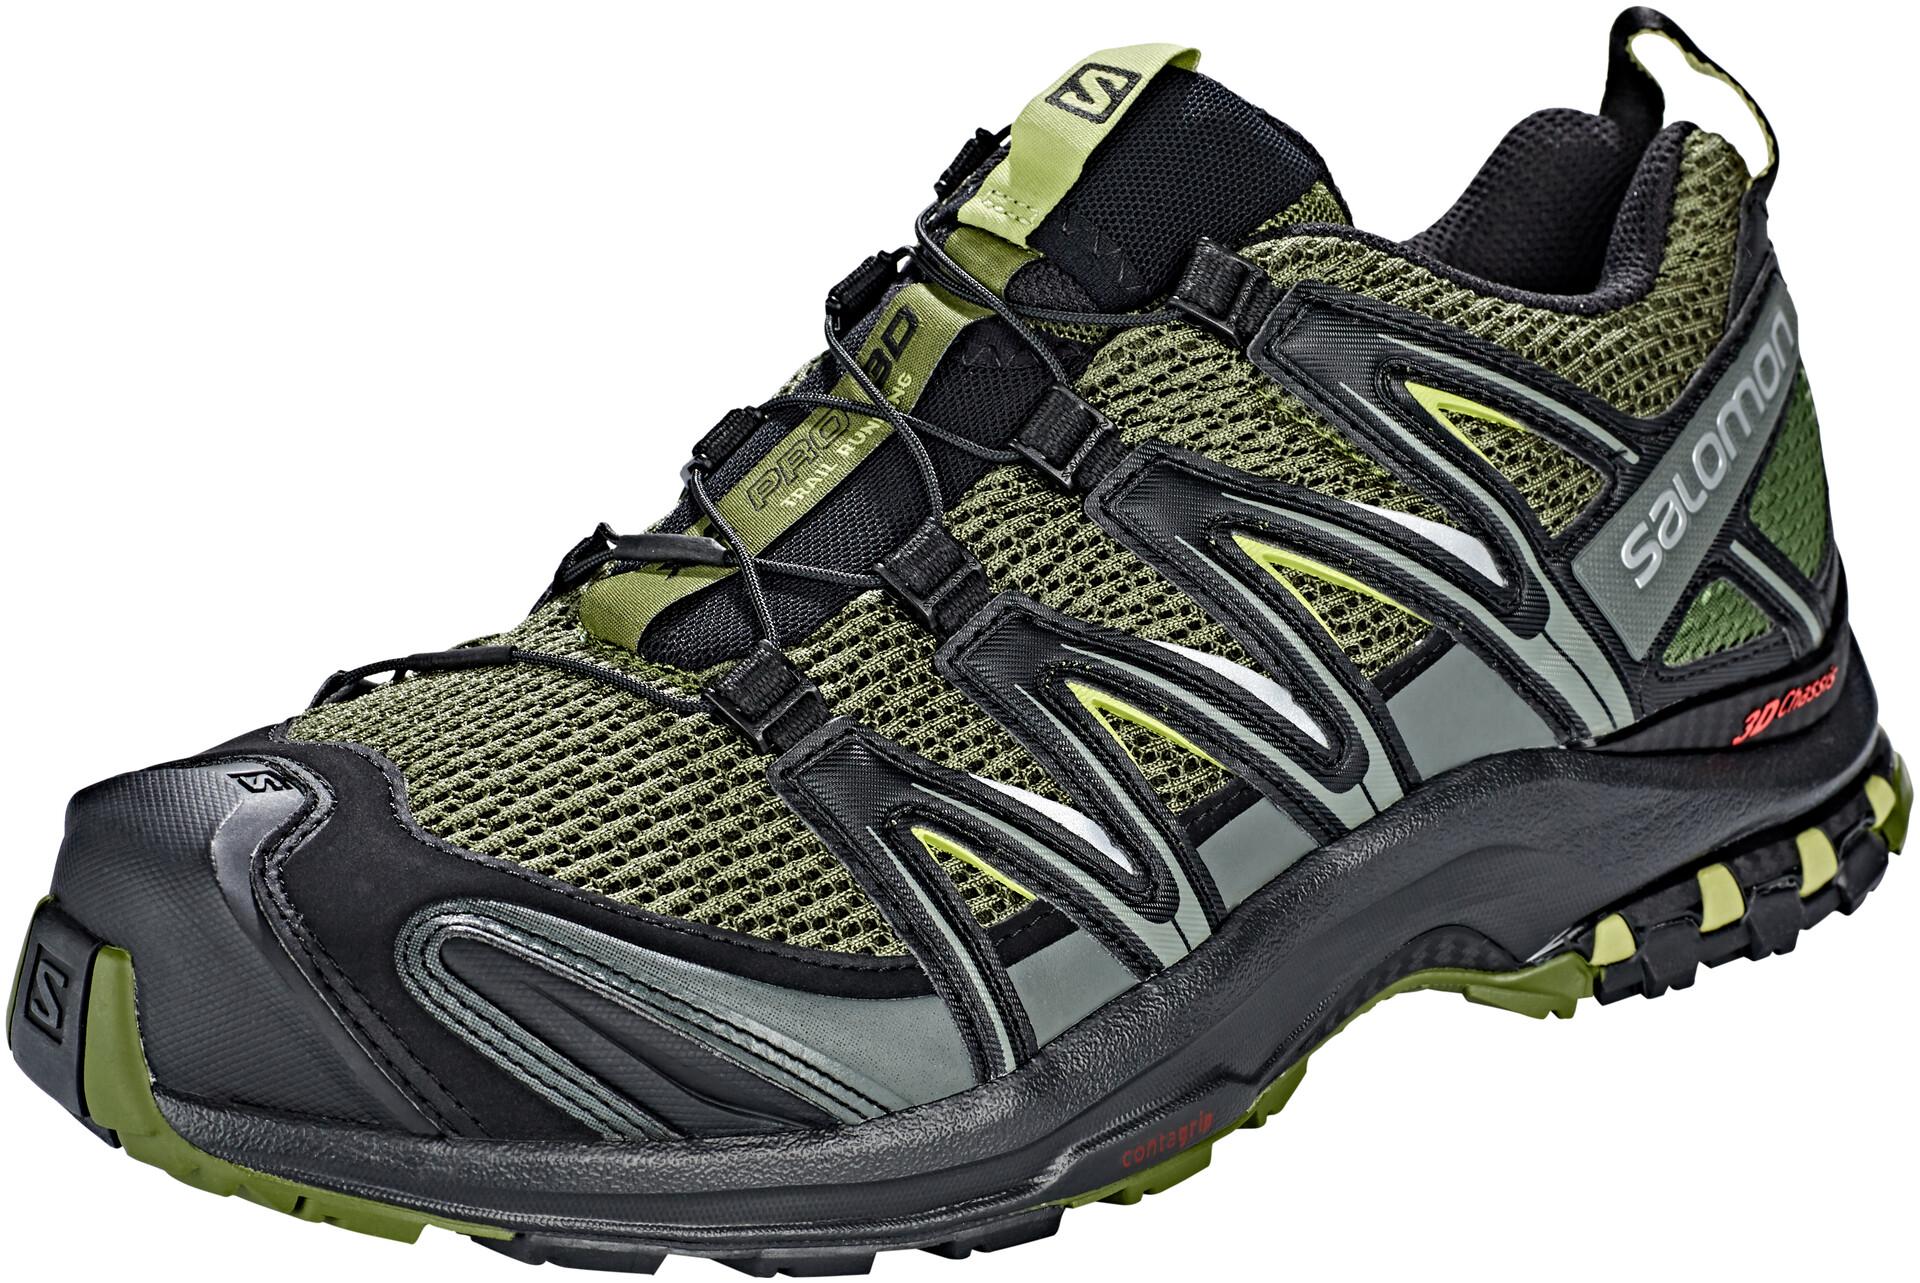 Pro 3d HommeChiveblackbeluga Salomon Chaussures Xa 1FlKTcJ